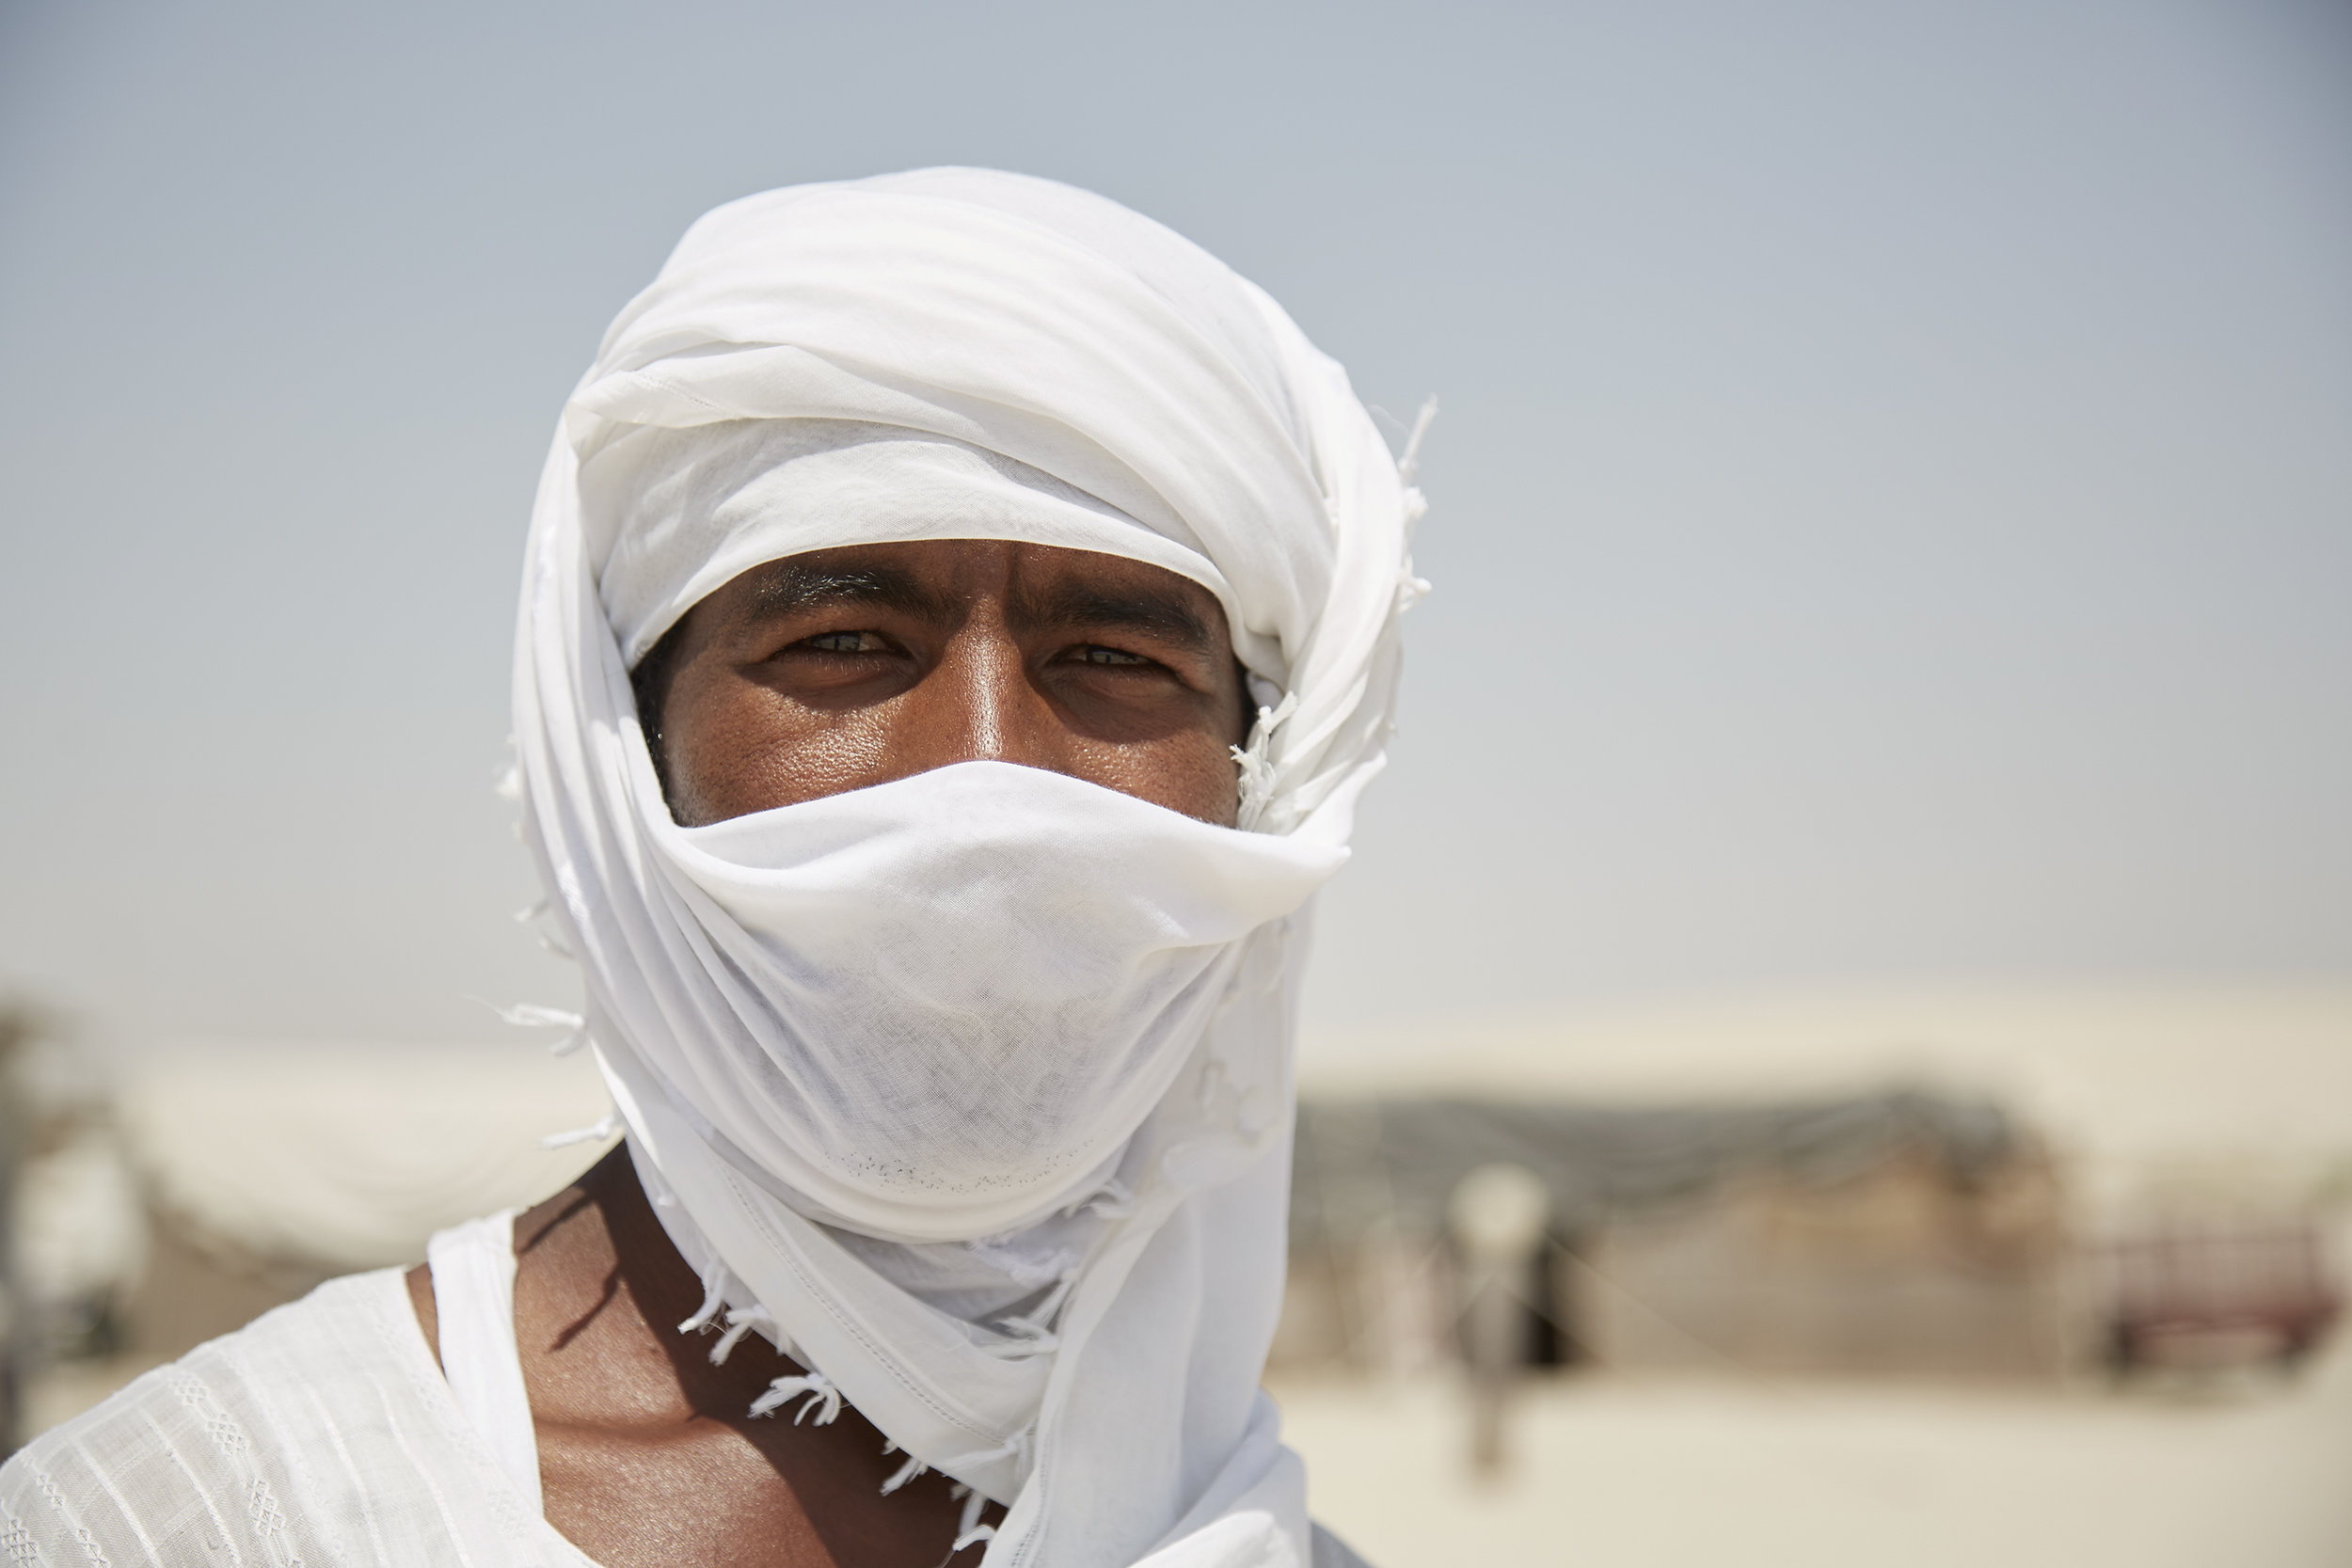 Sudanese Camel Caretaker, (near Mesaieed, Qatar)